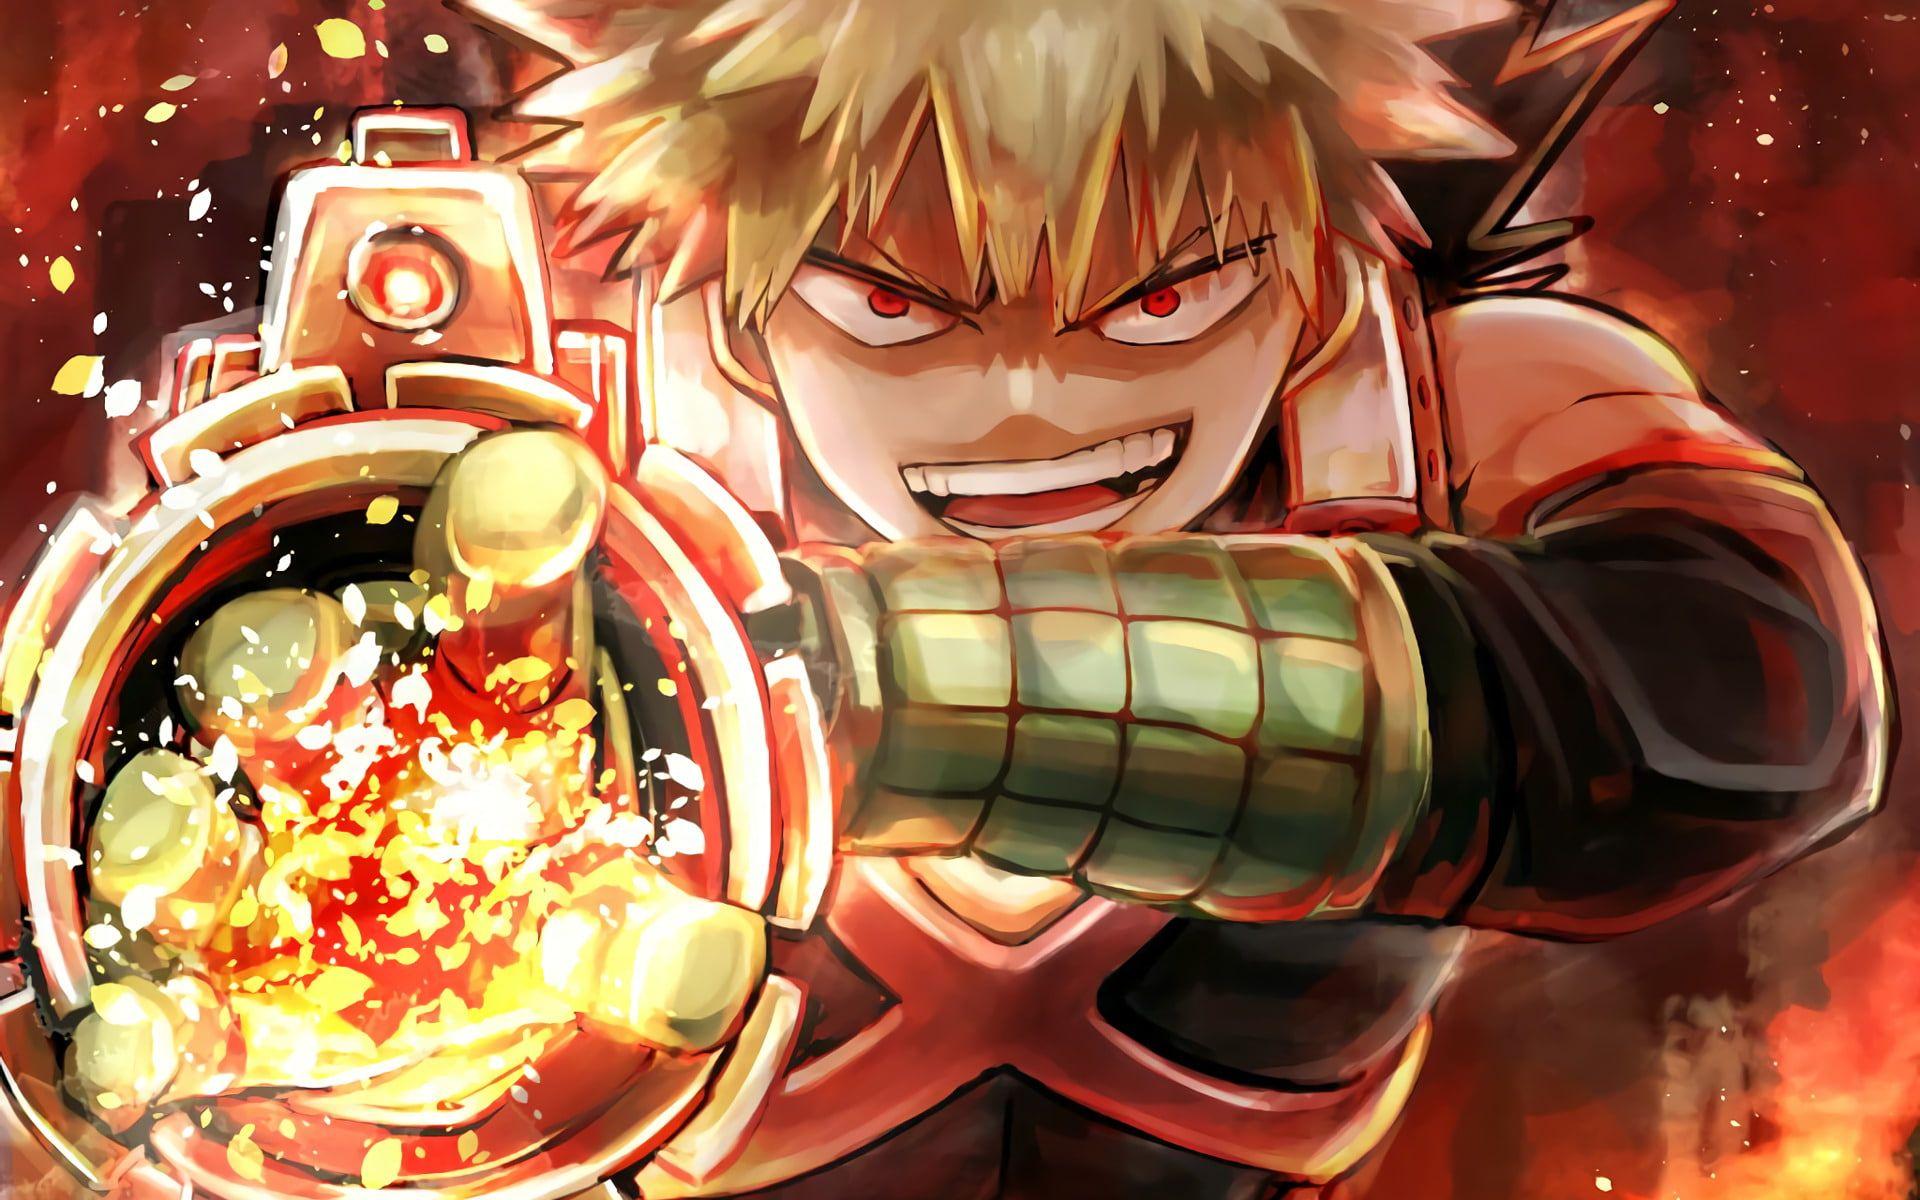 Anime My Hero Academia Katsuki Bakugou 1080p Wallpaper